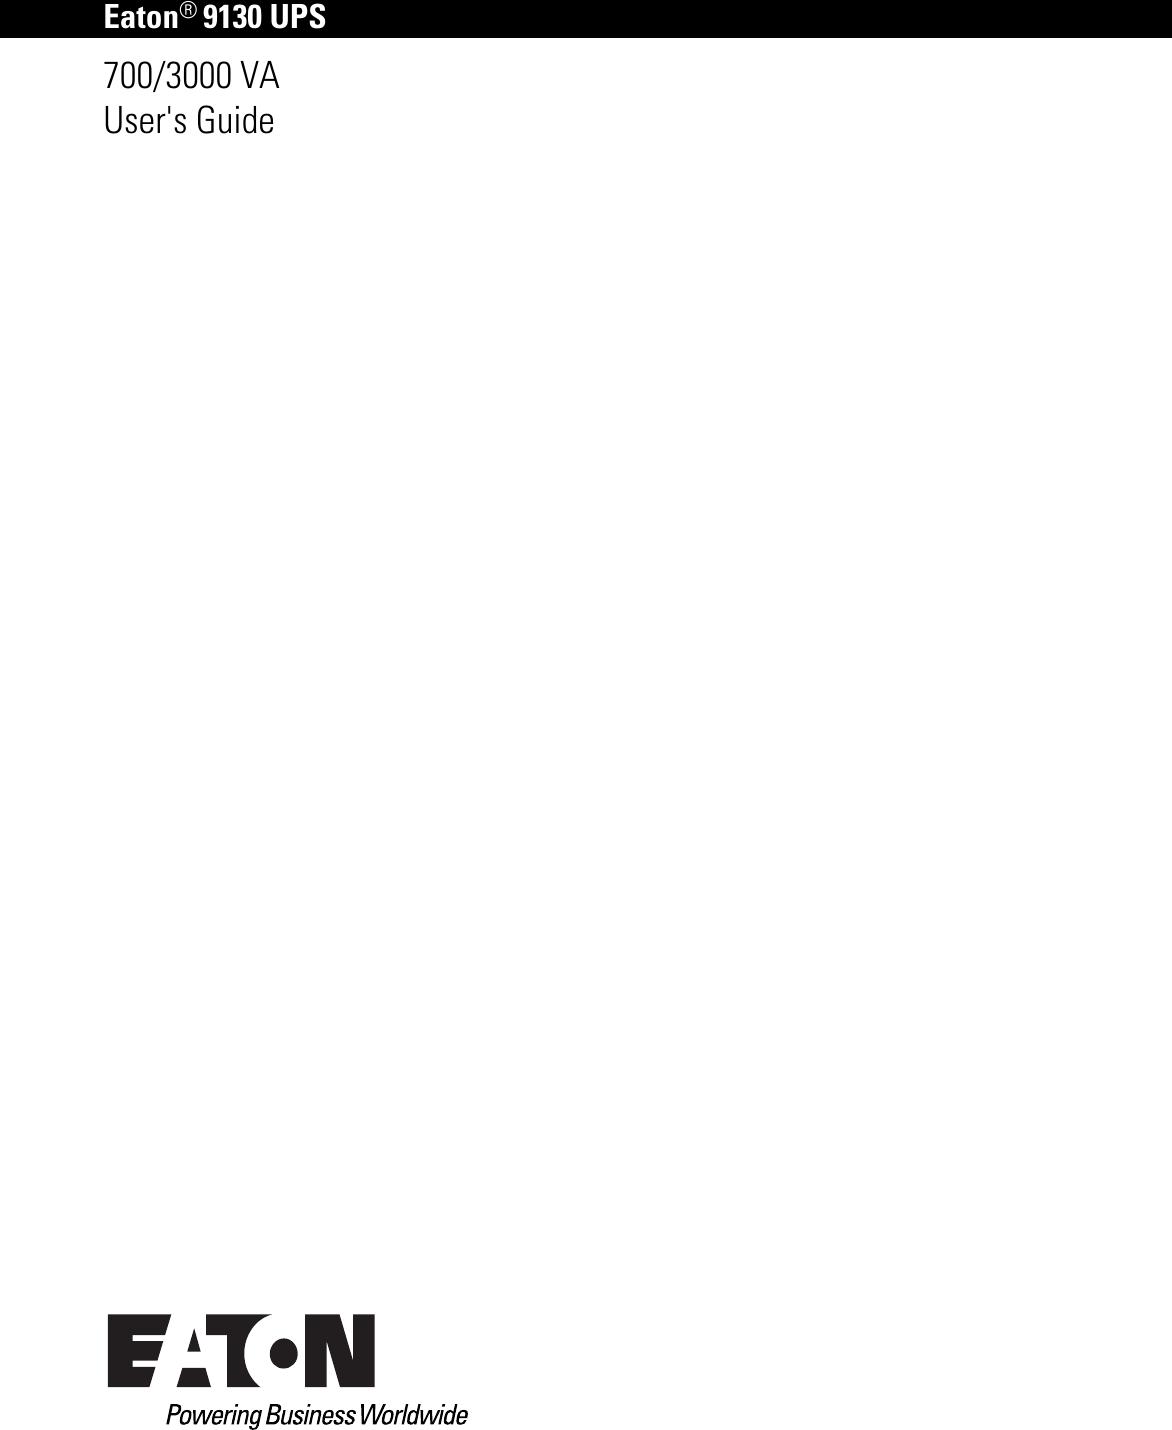 Eaton 9130 Wiring Diagram Electrical Diagrams 700 3000 Va Ups Users Guide 691978 Installatioun Sheet Hmmwv